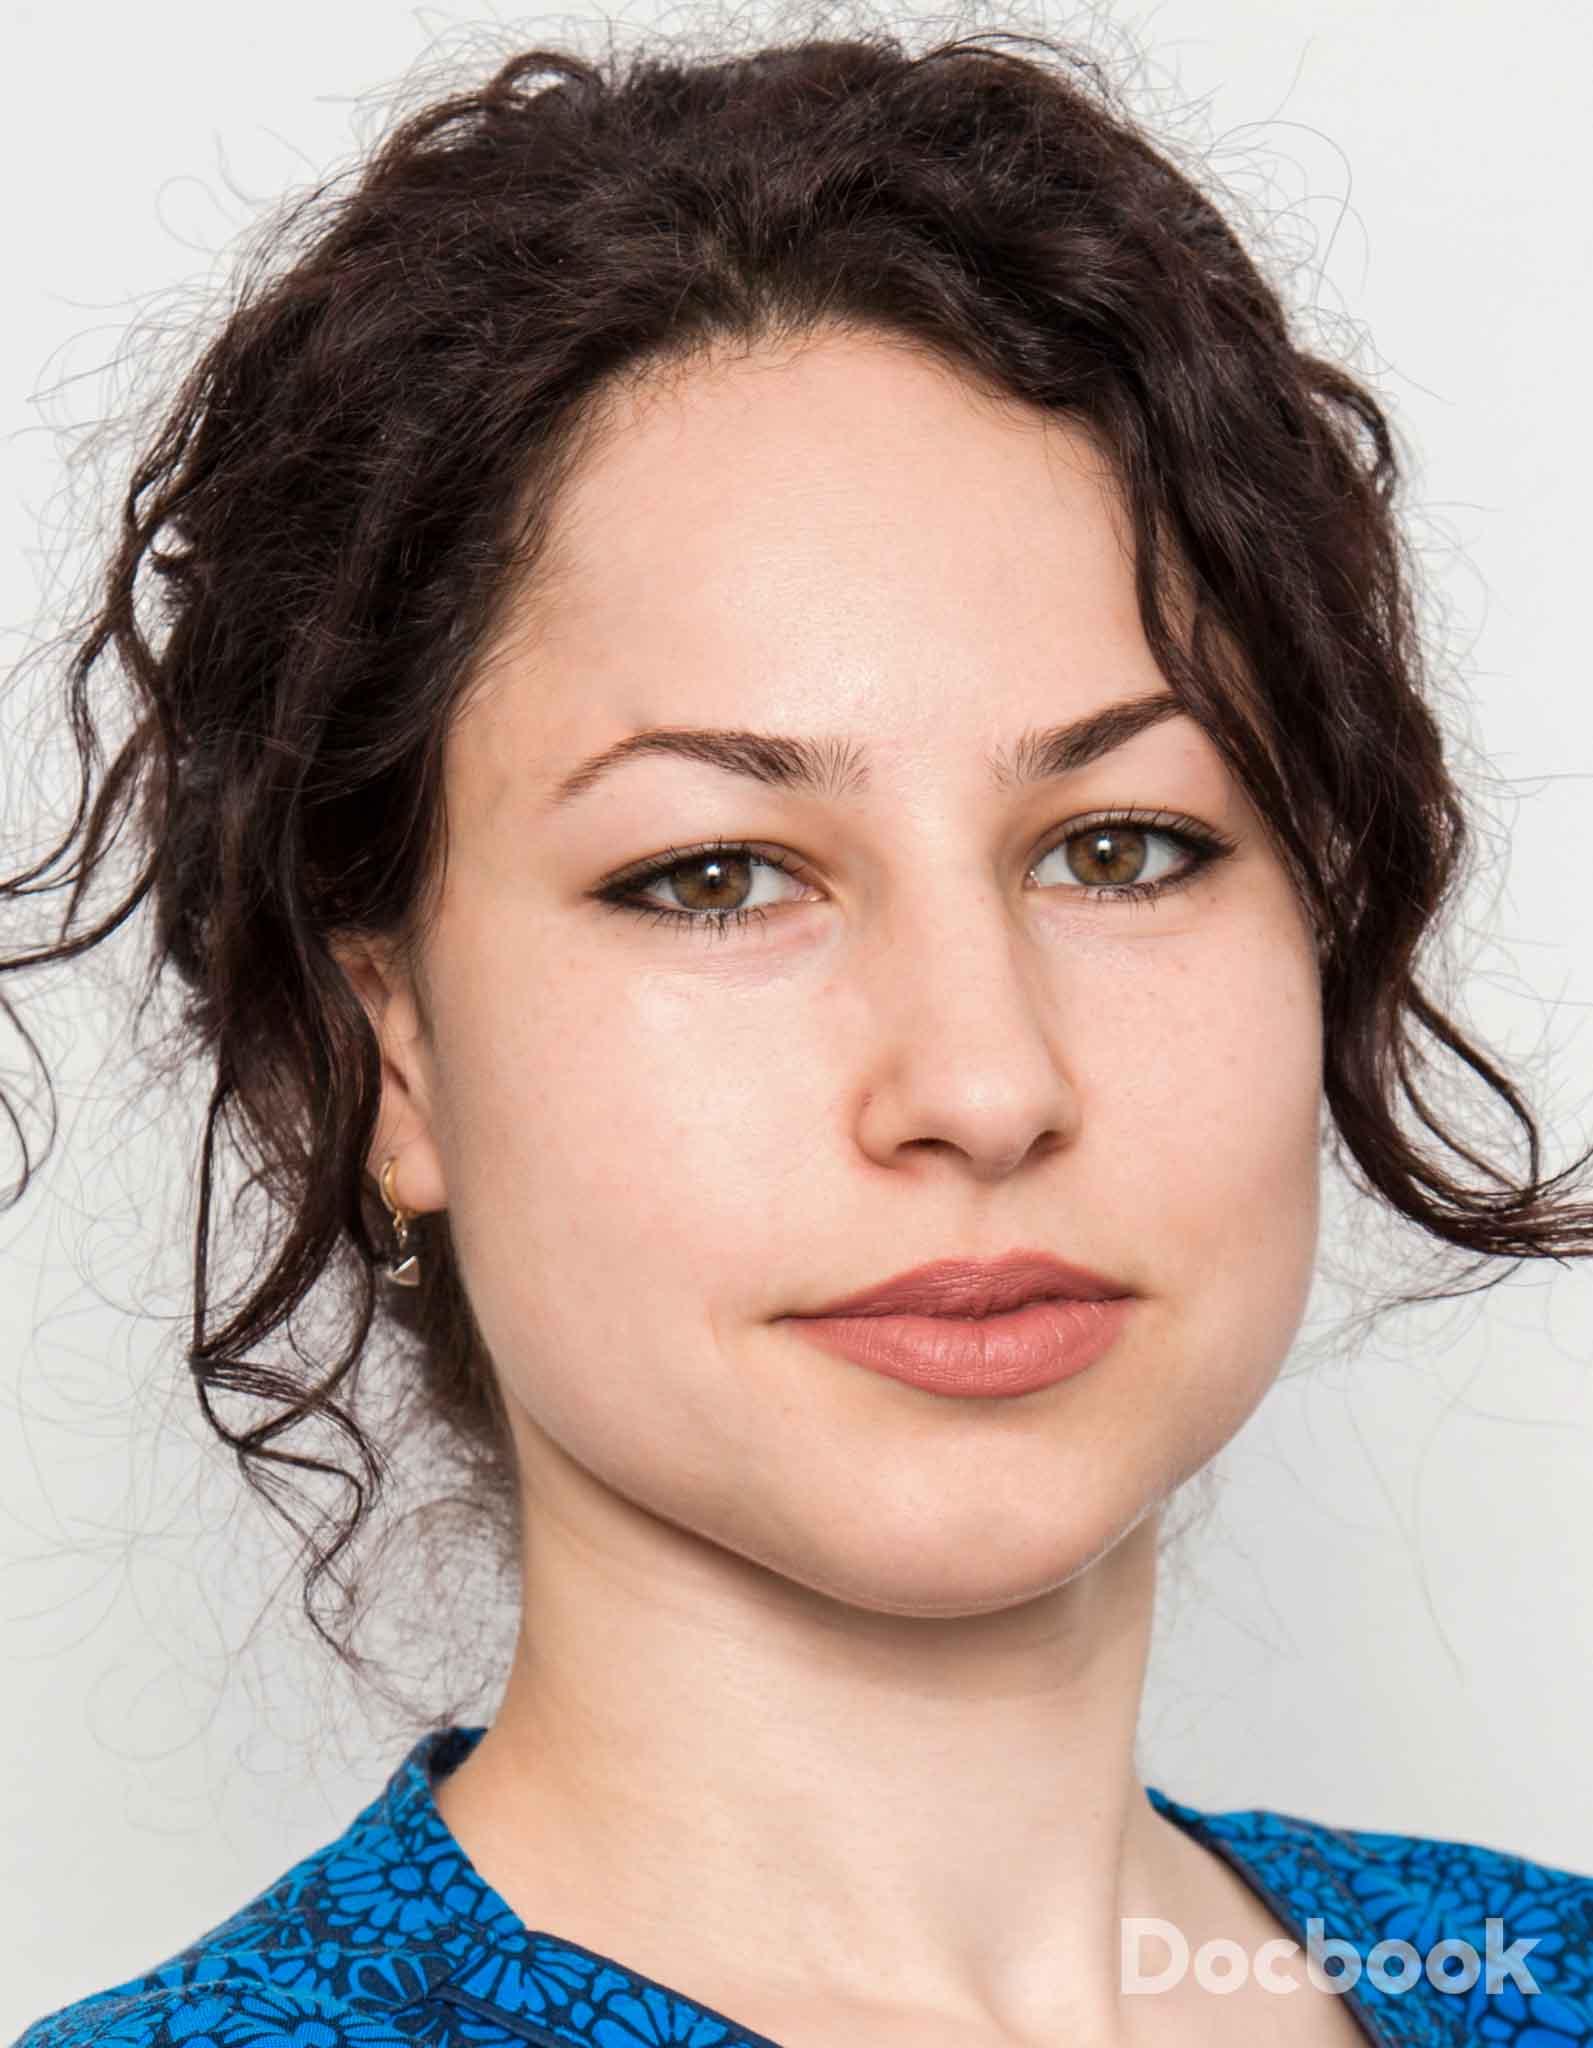 Dr. Diana Stanescu